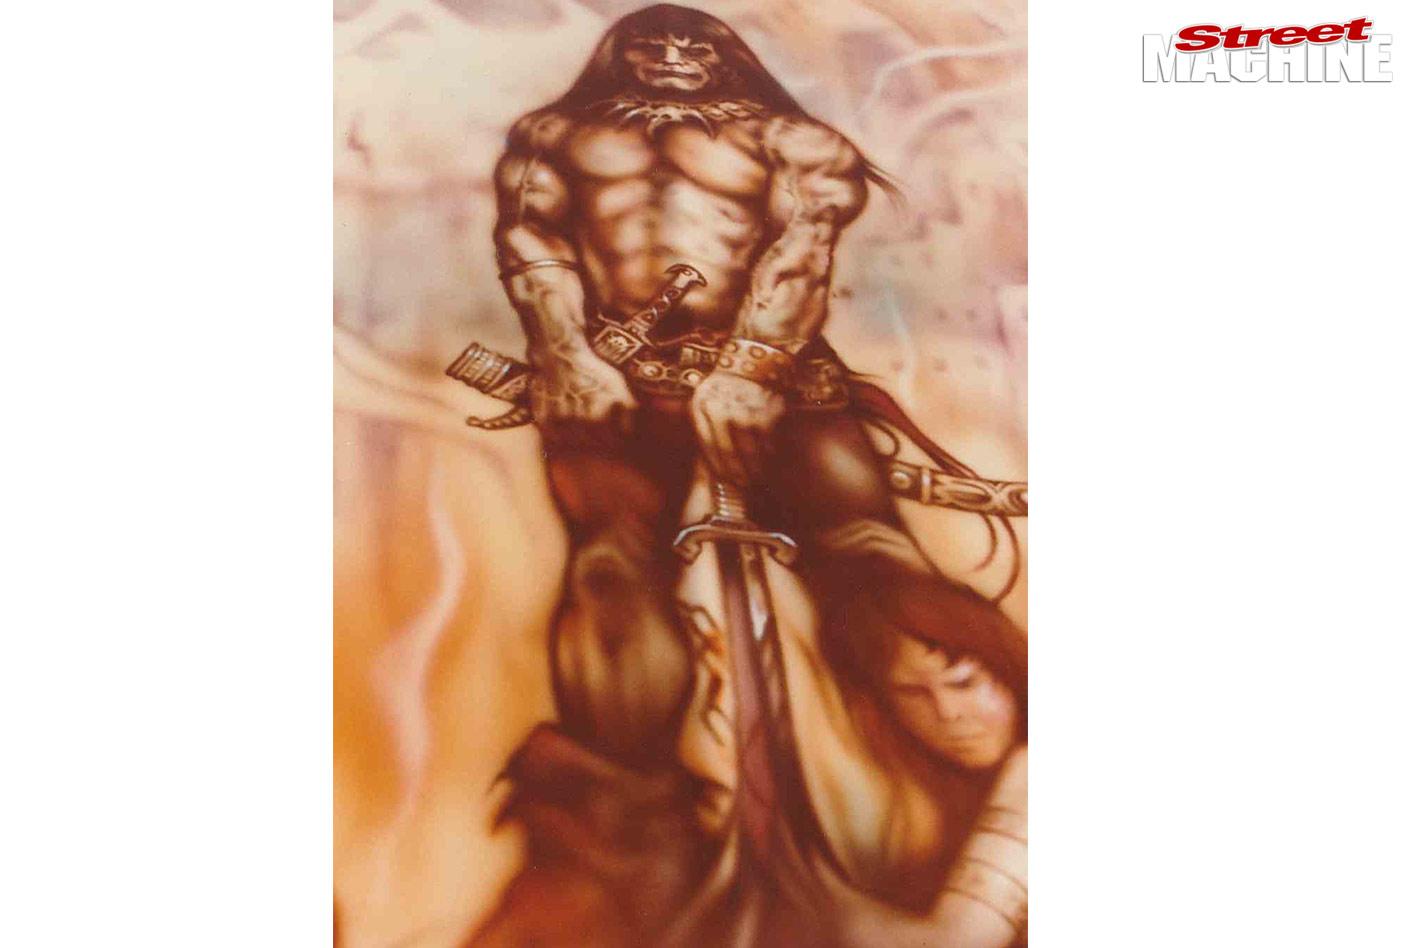 Conan The Barbarian mural